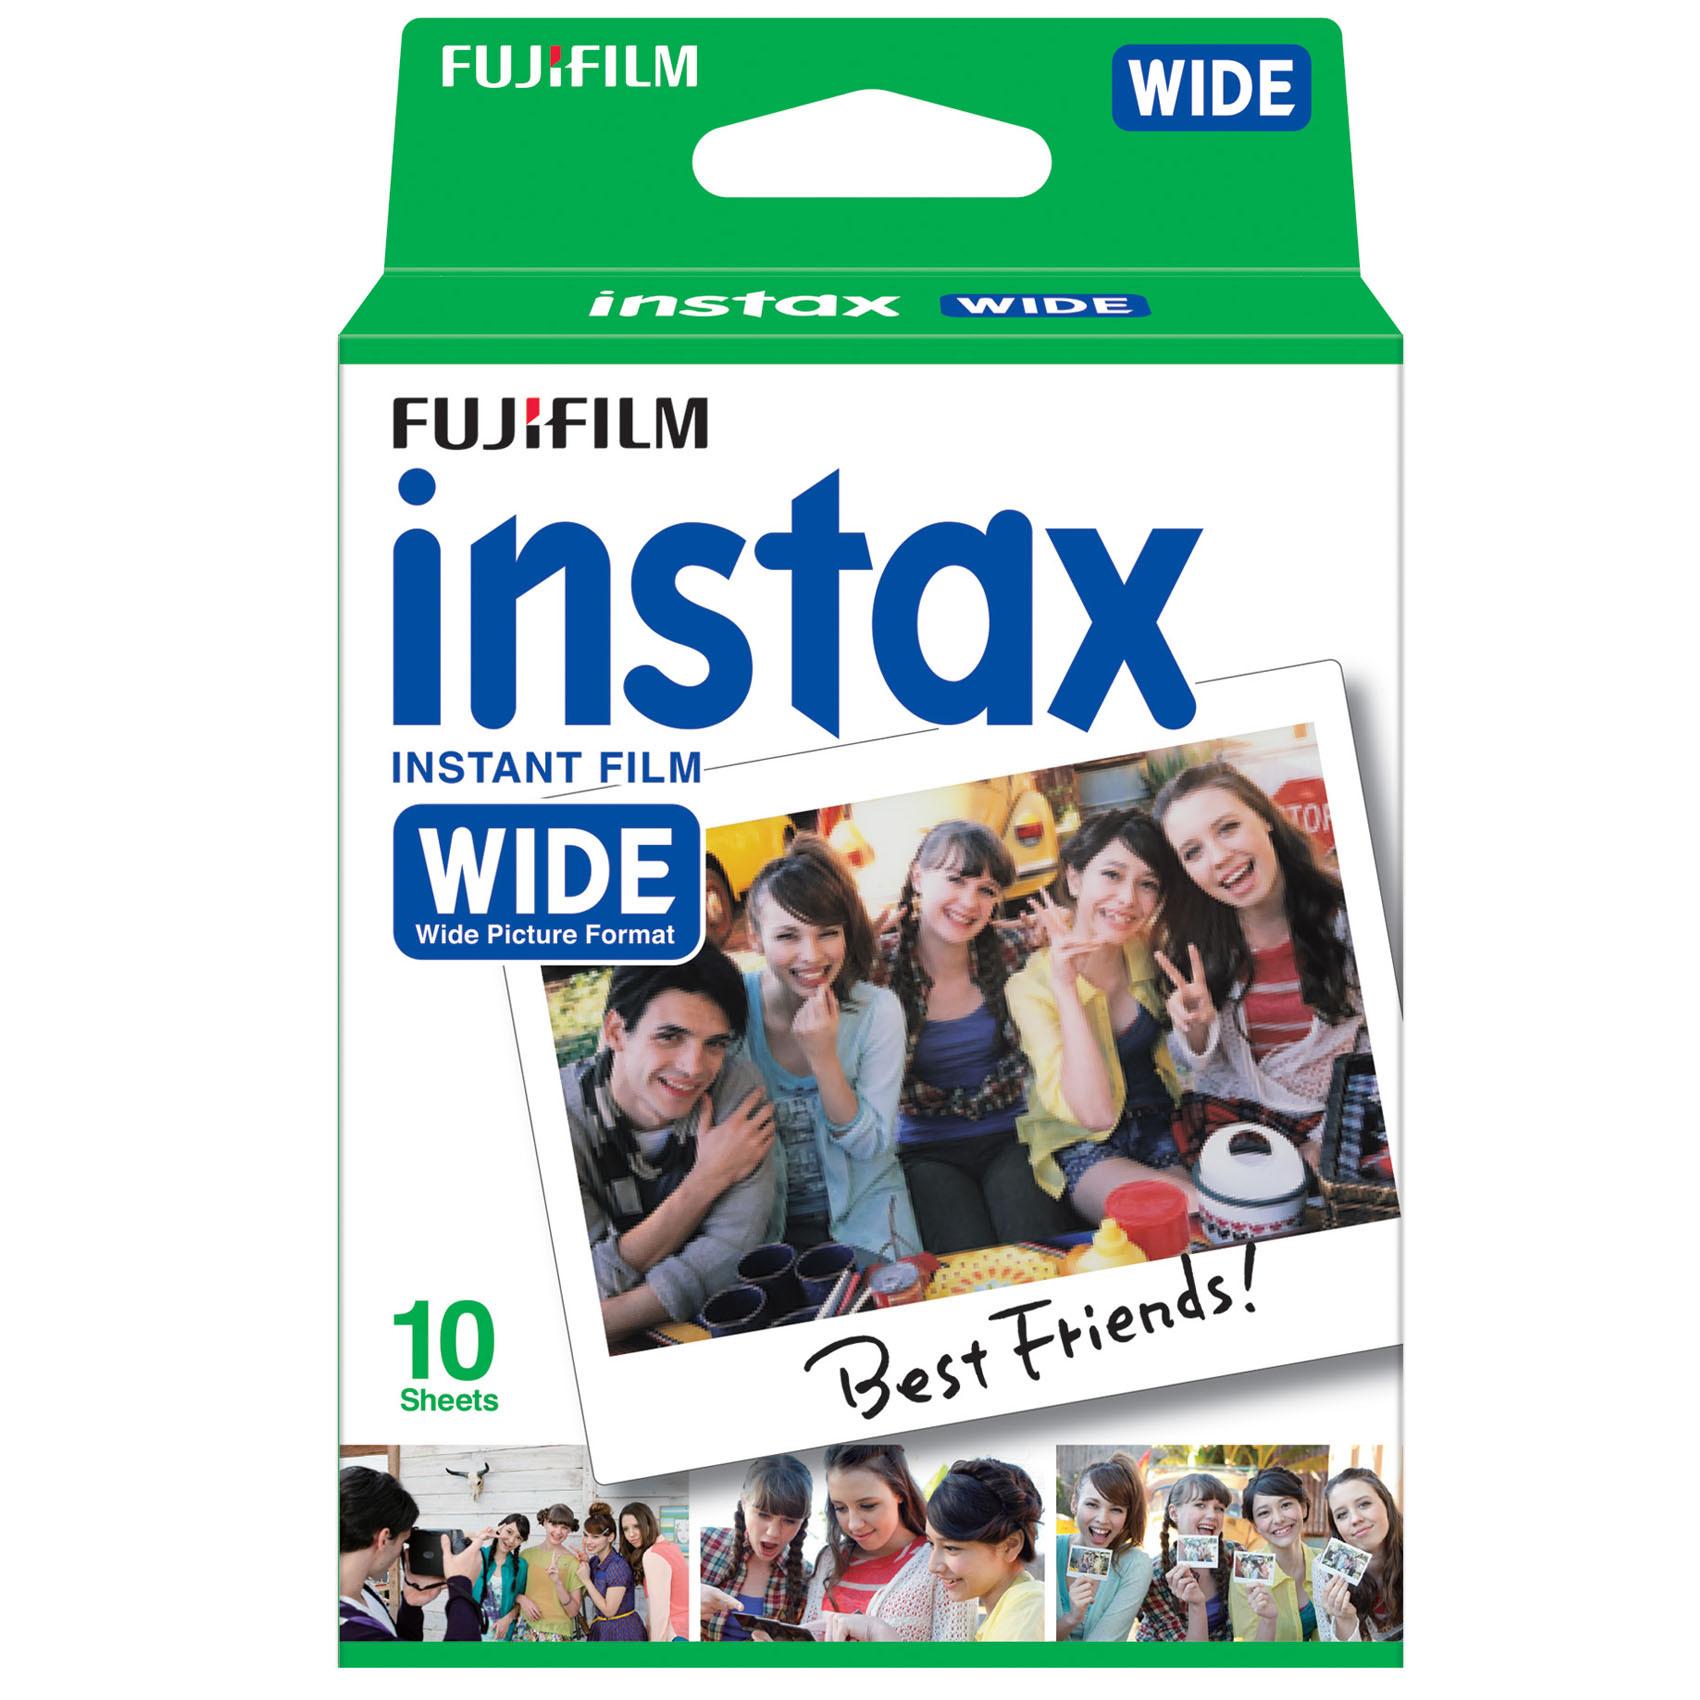 FUJIFILM - FILM INSTAX WIDE 10PACK